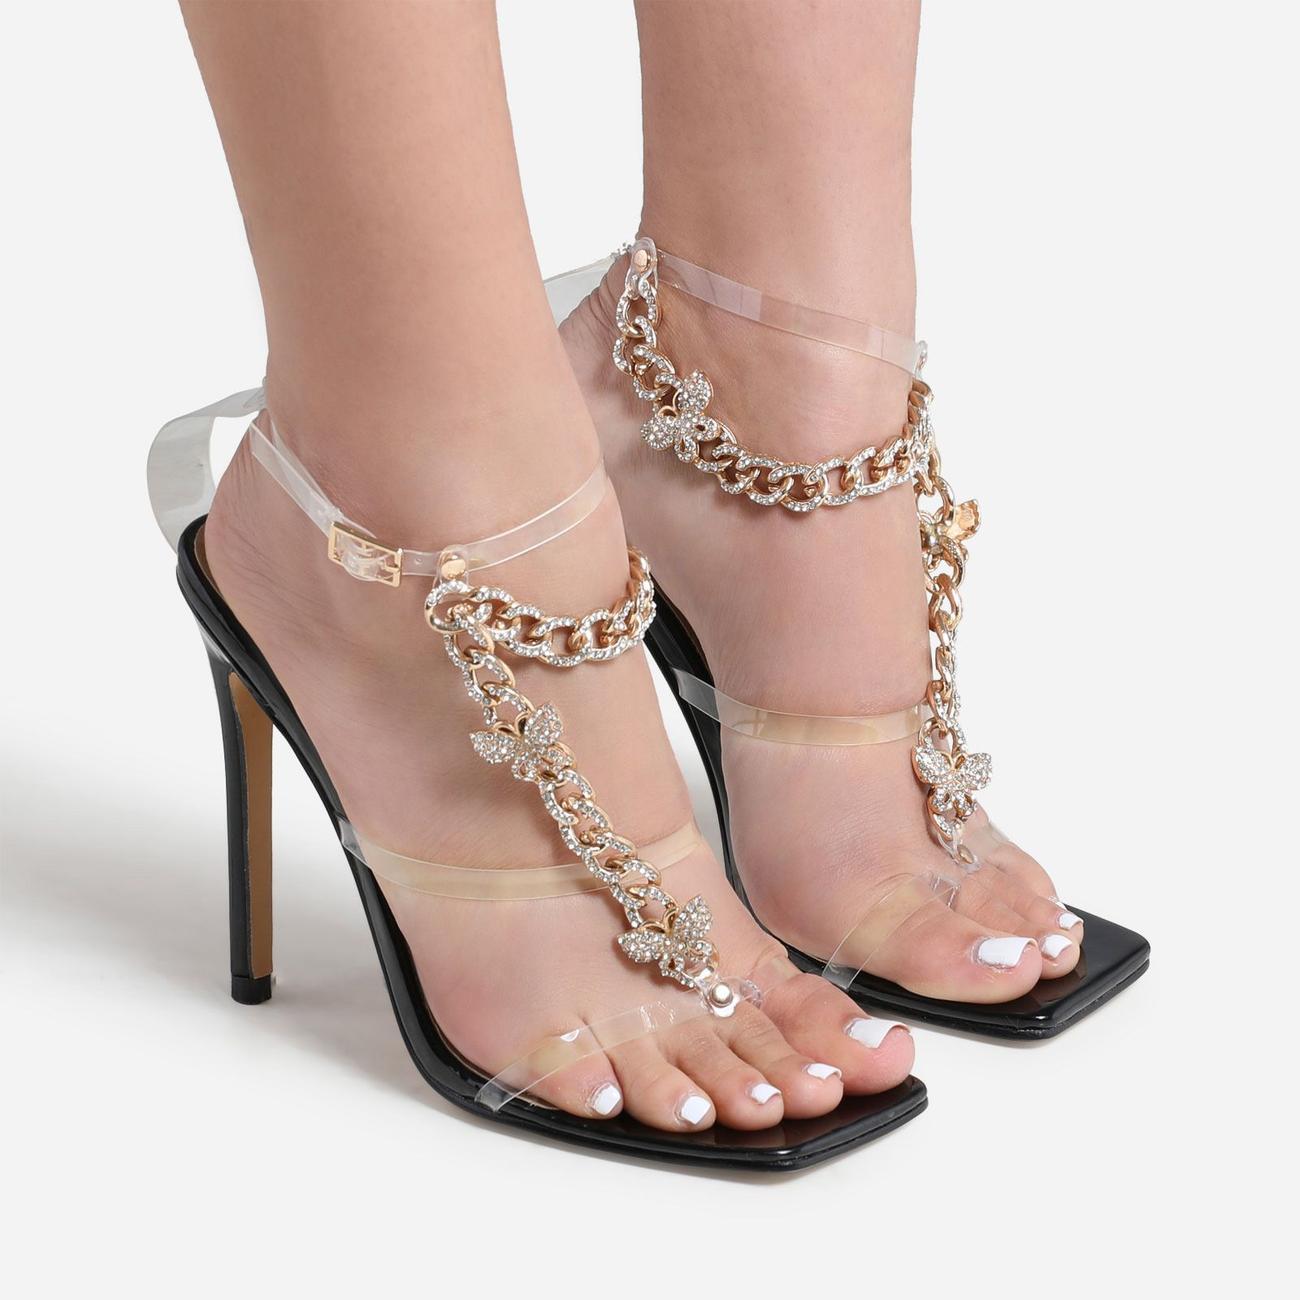 Cabana Diamante Gem Chain Detail Square Toe Heel In Black Patent Image 2